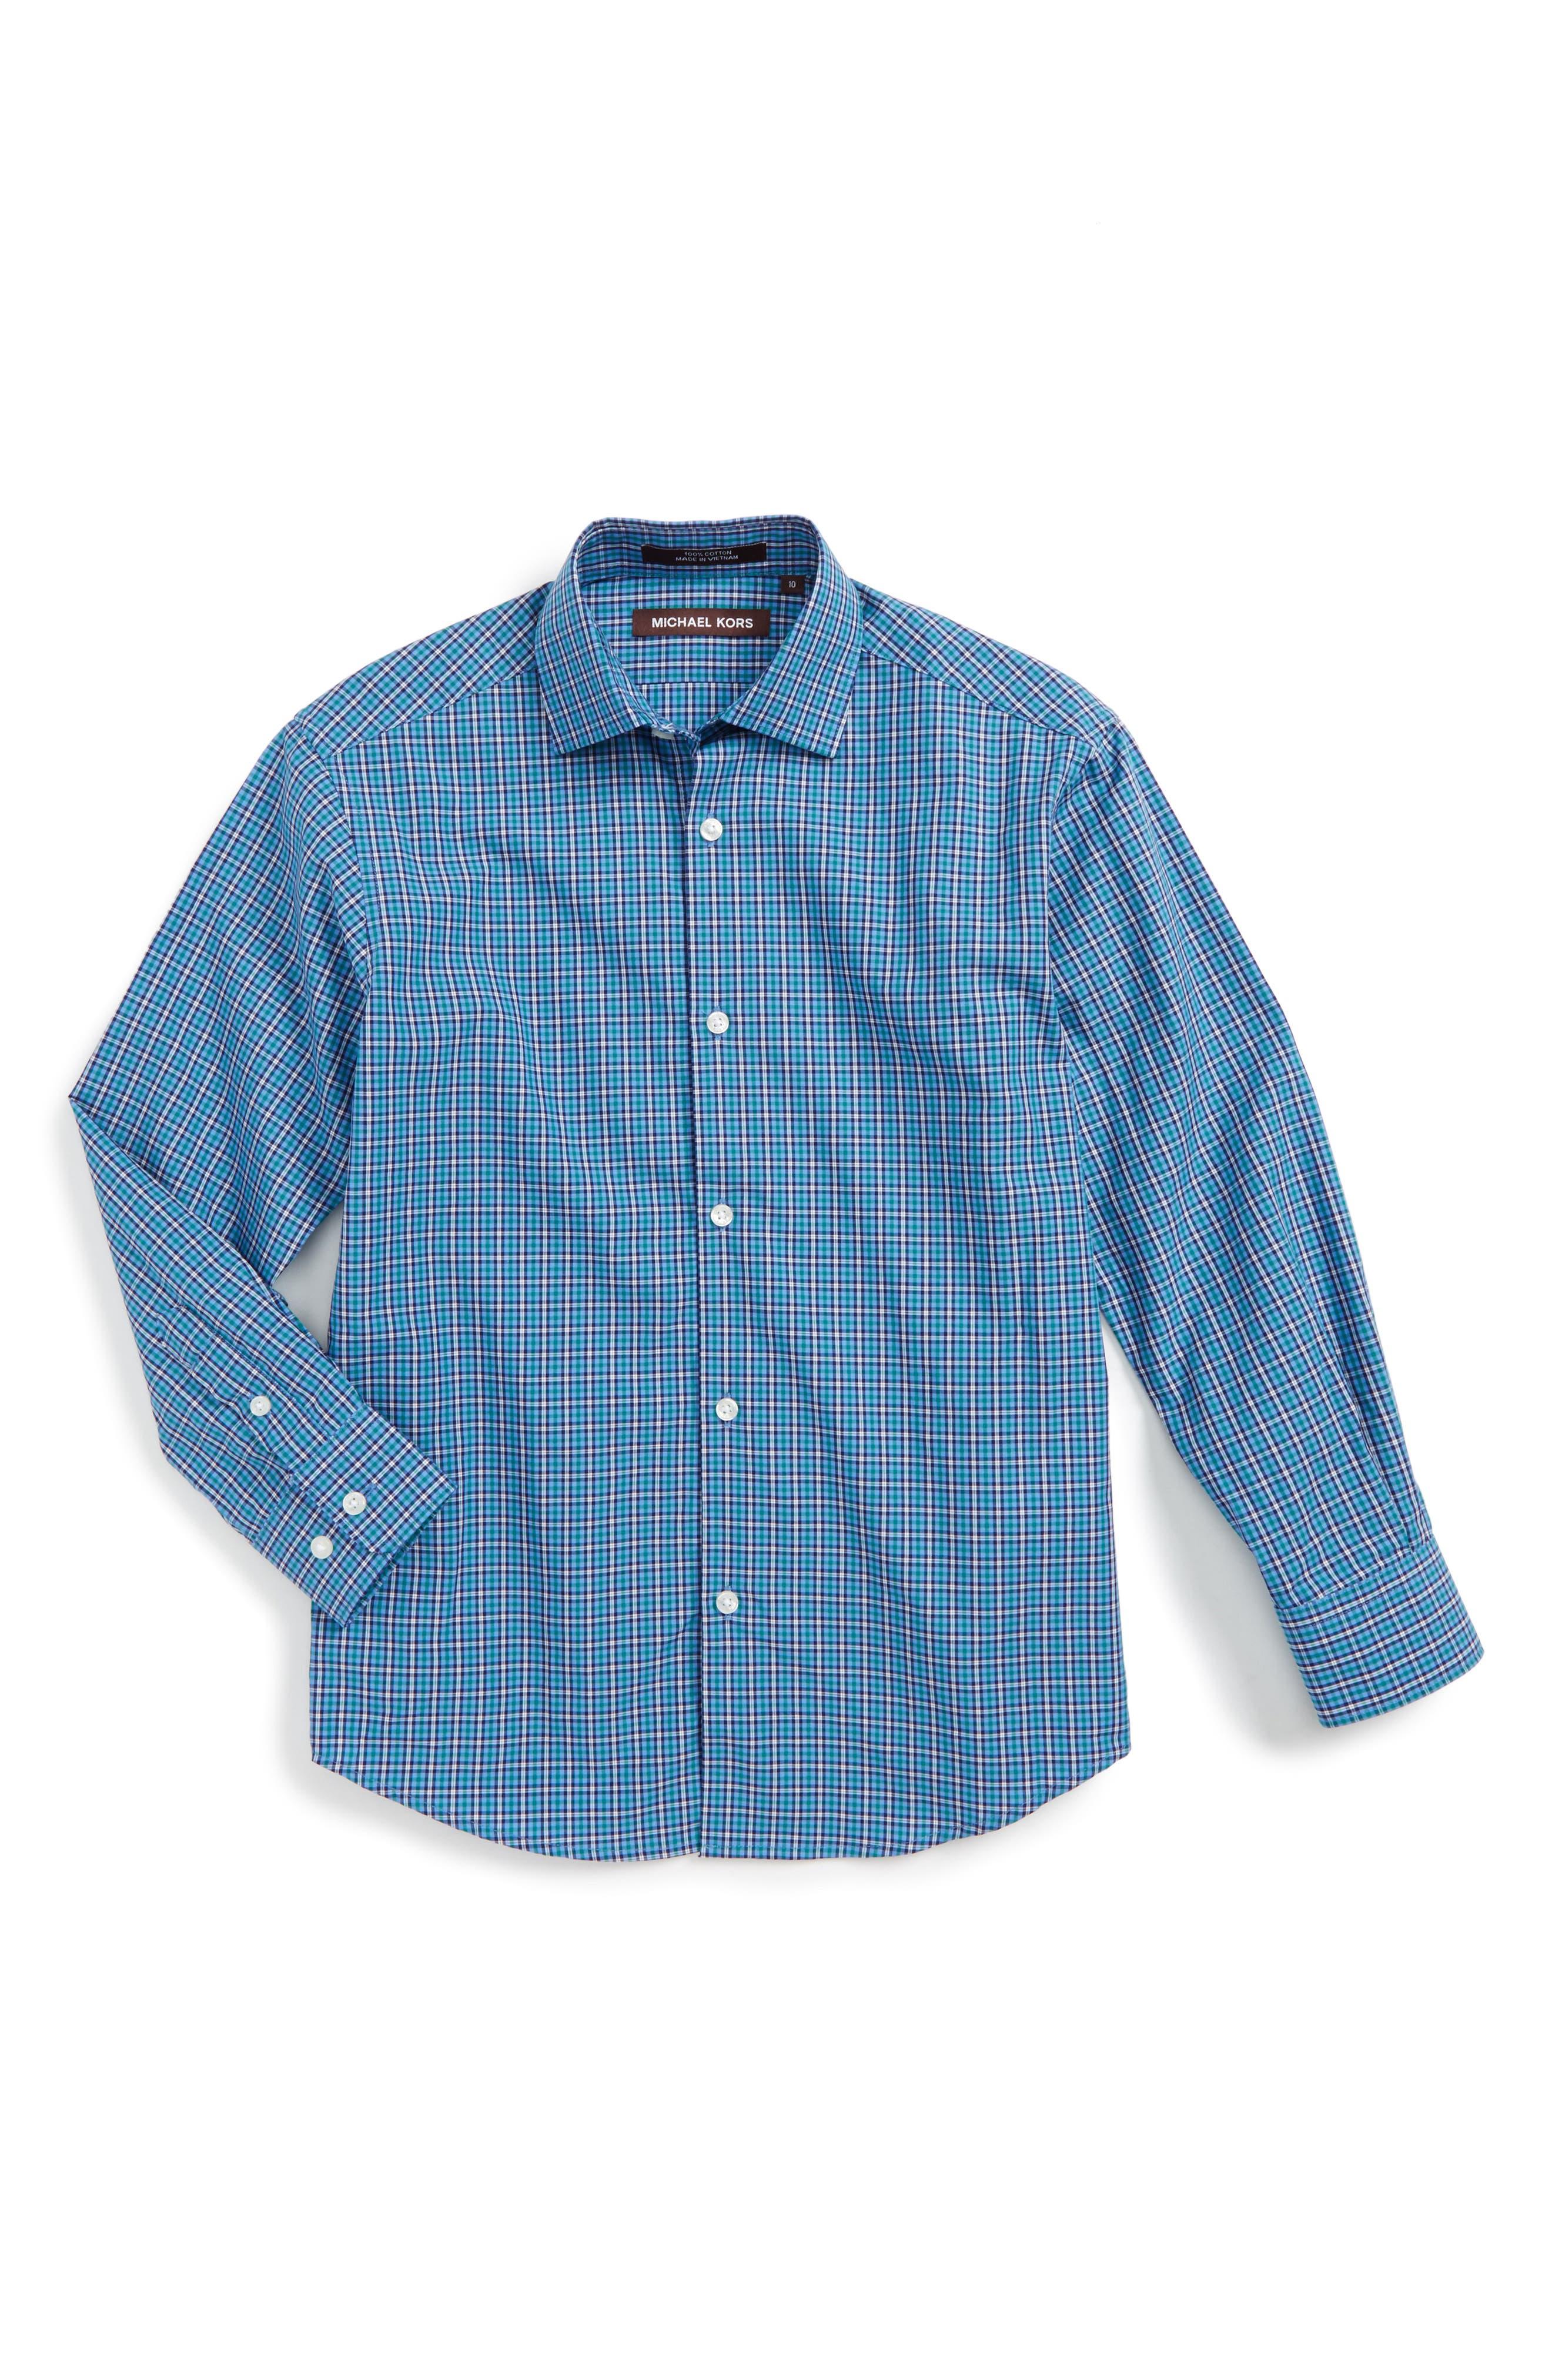 Alternate Image 1 Selected - Michael Kors Check Dress Shirt (Big Boys)